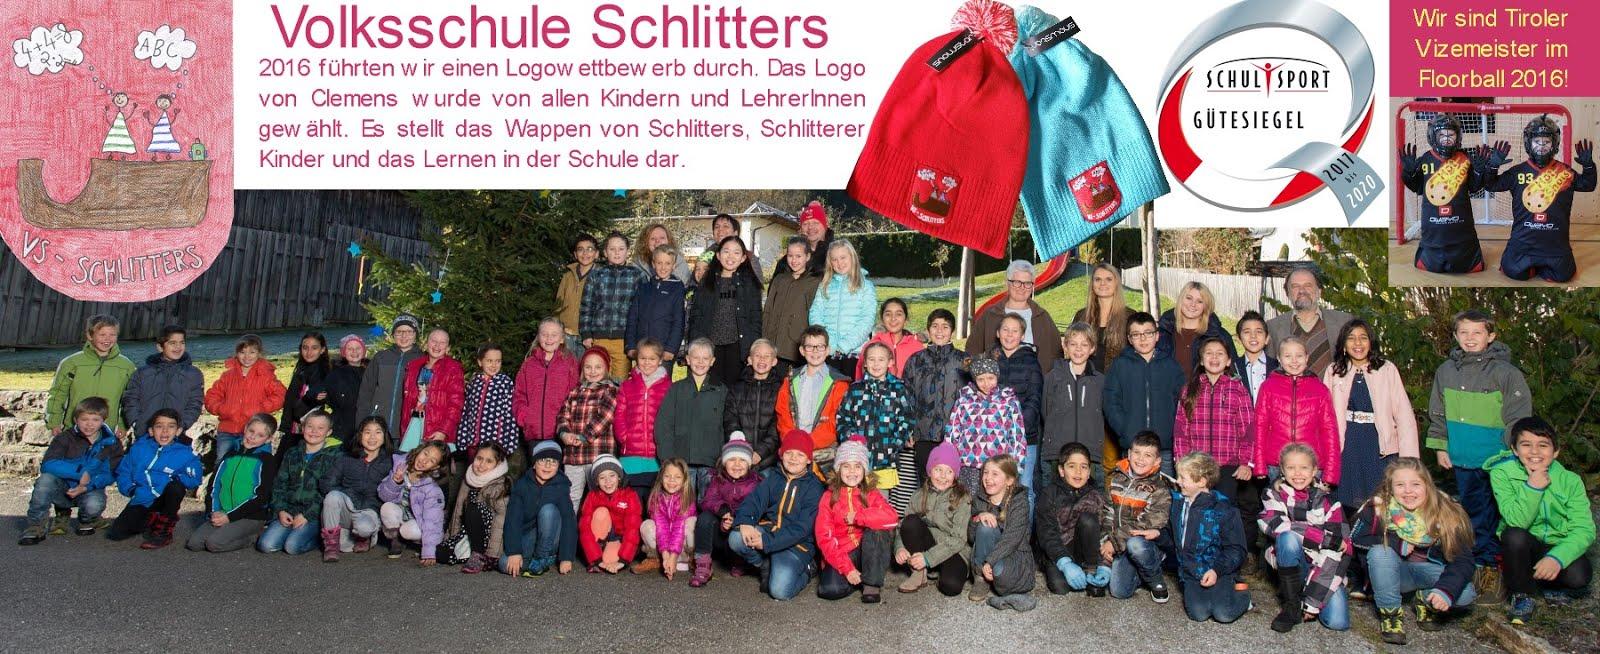 Volksschule Schlitters Fotos